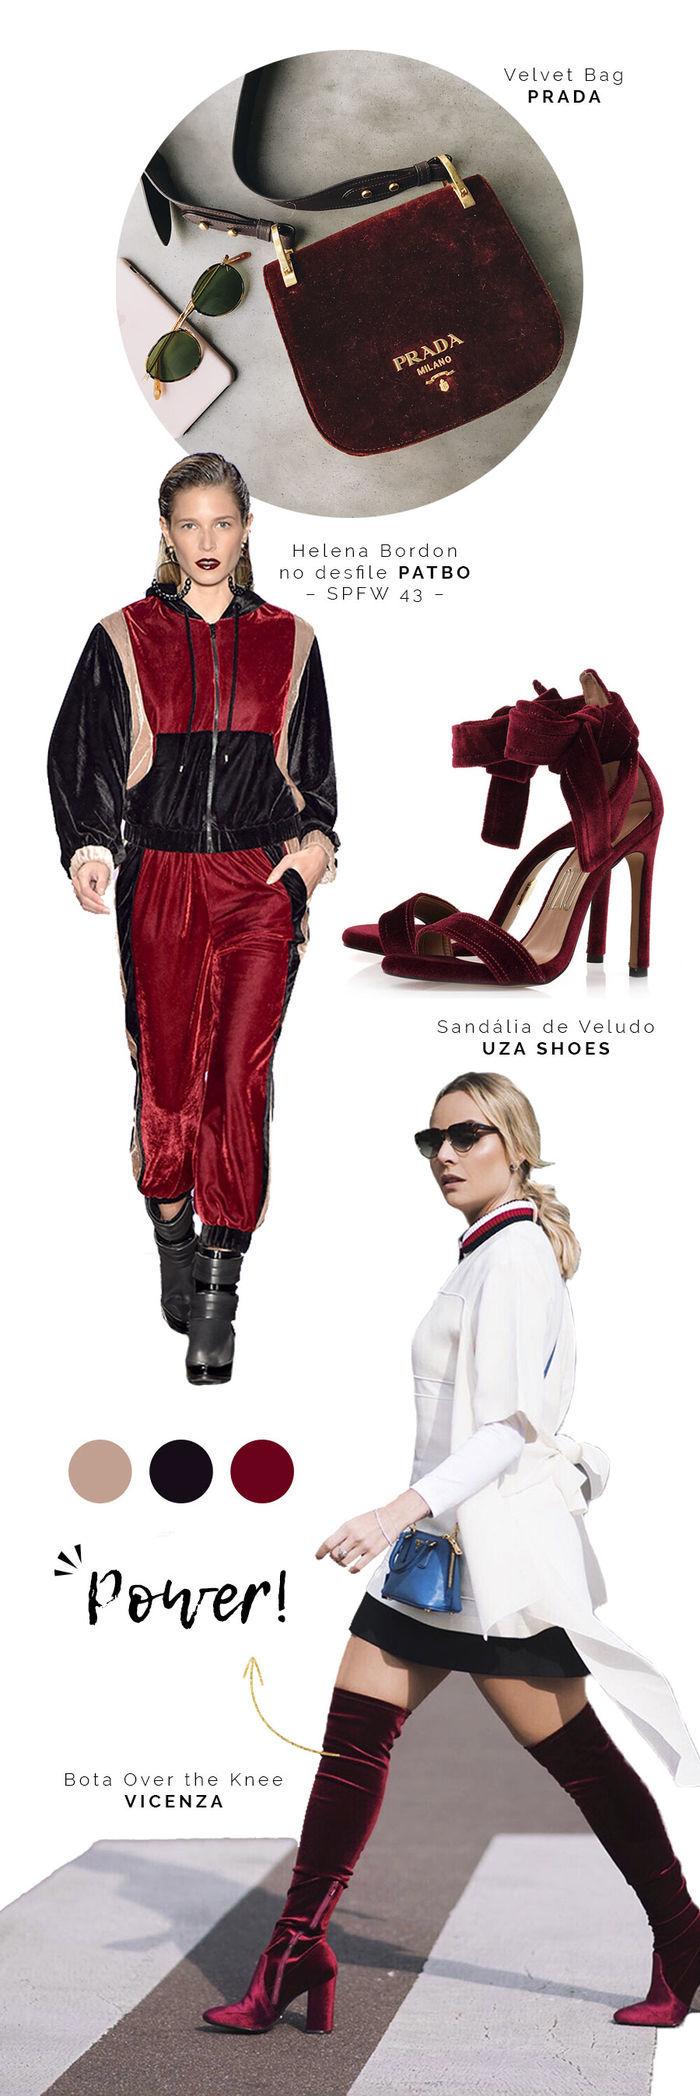 Layla Monteiro Look Inverno Veludo Tendencia PatBo Streetswear Bolsa Prada Sandália Over The Knee 2017